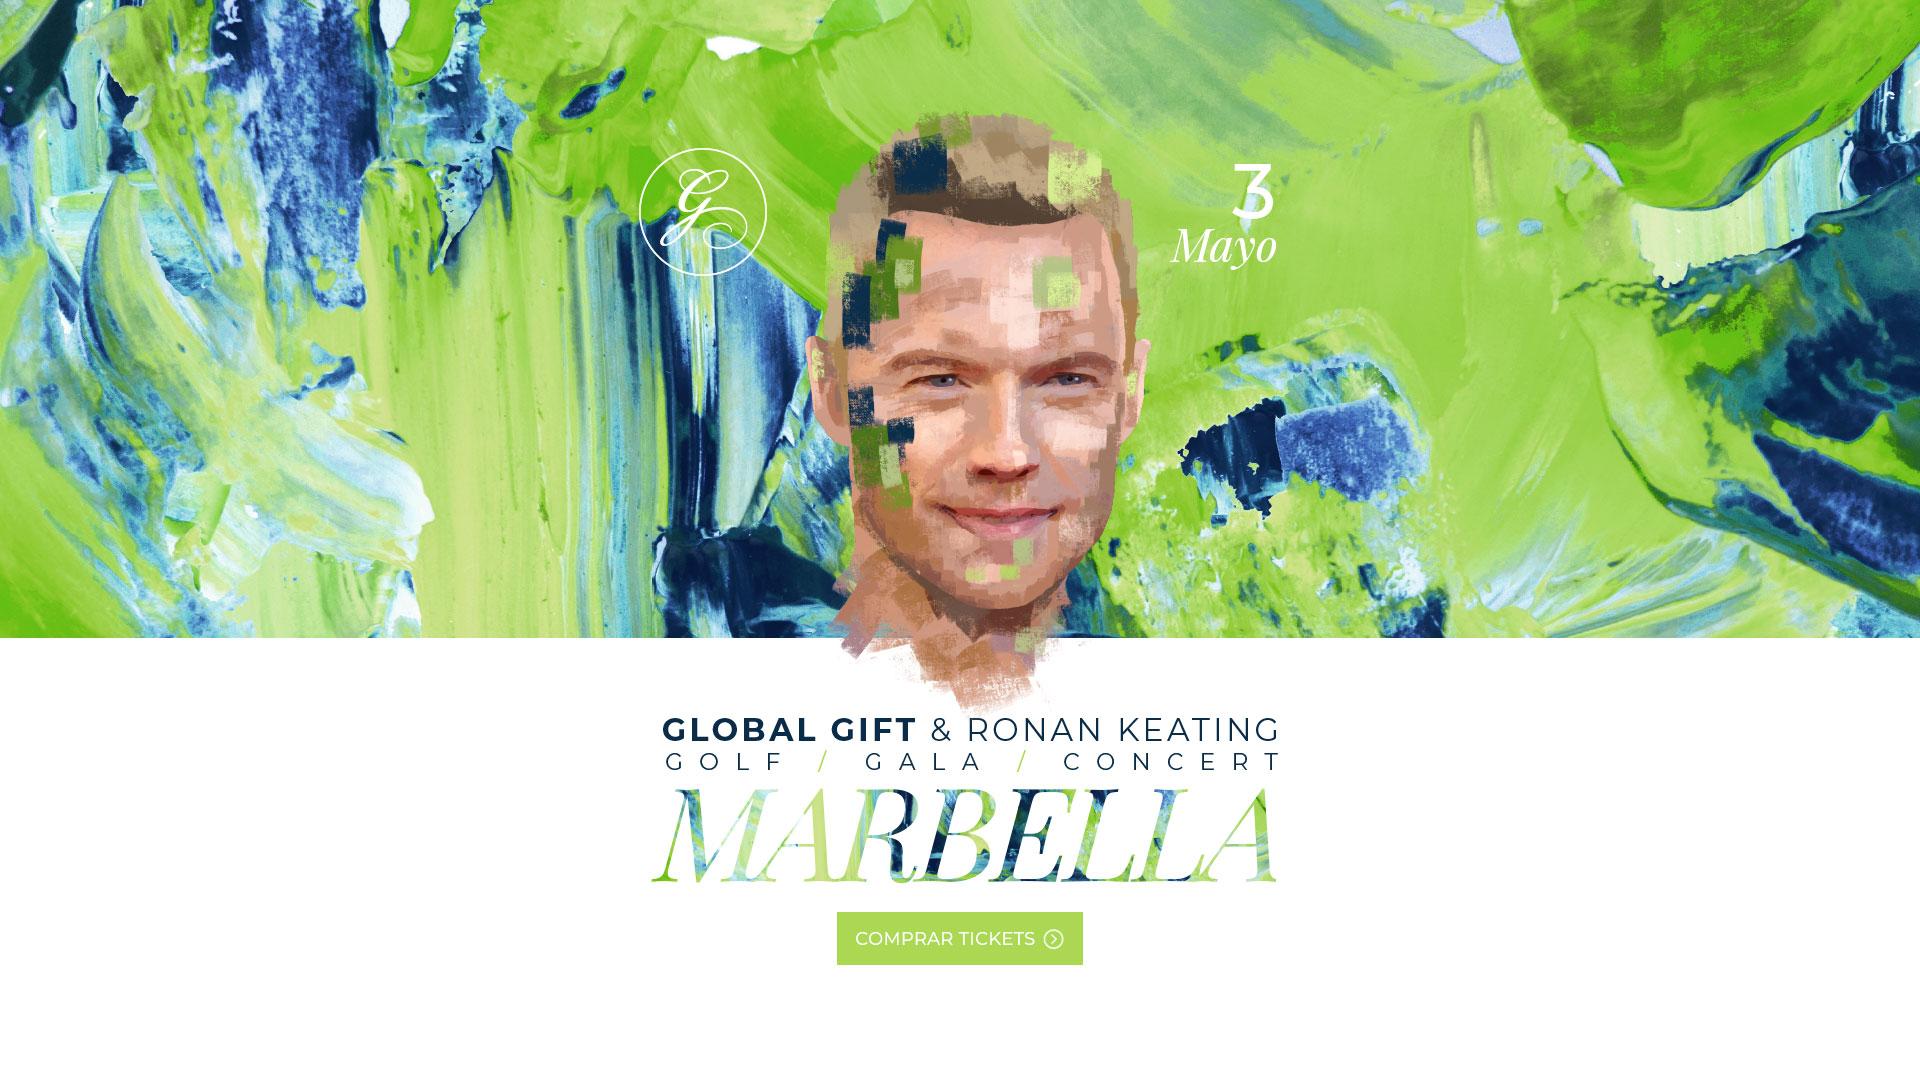 Global Gift & Ronan Keating - Golf / Gala / Concert - Marbella